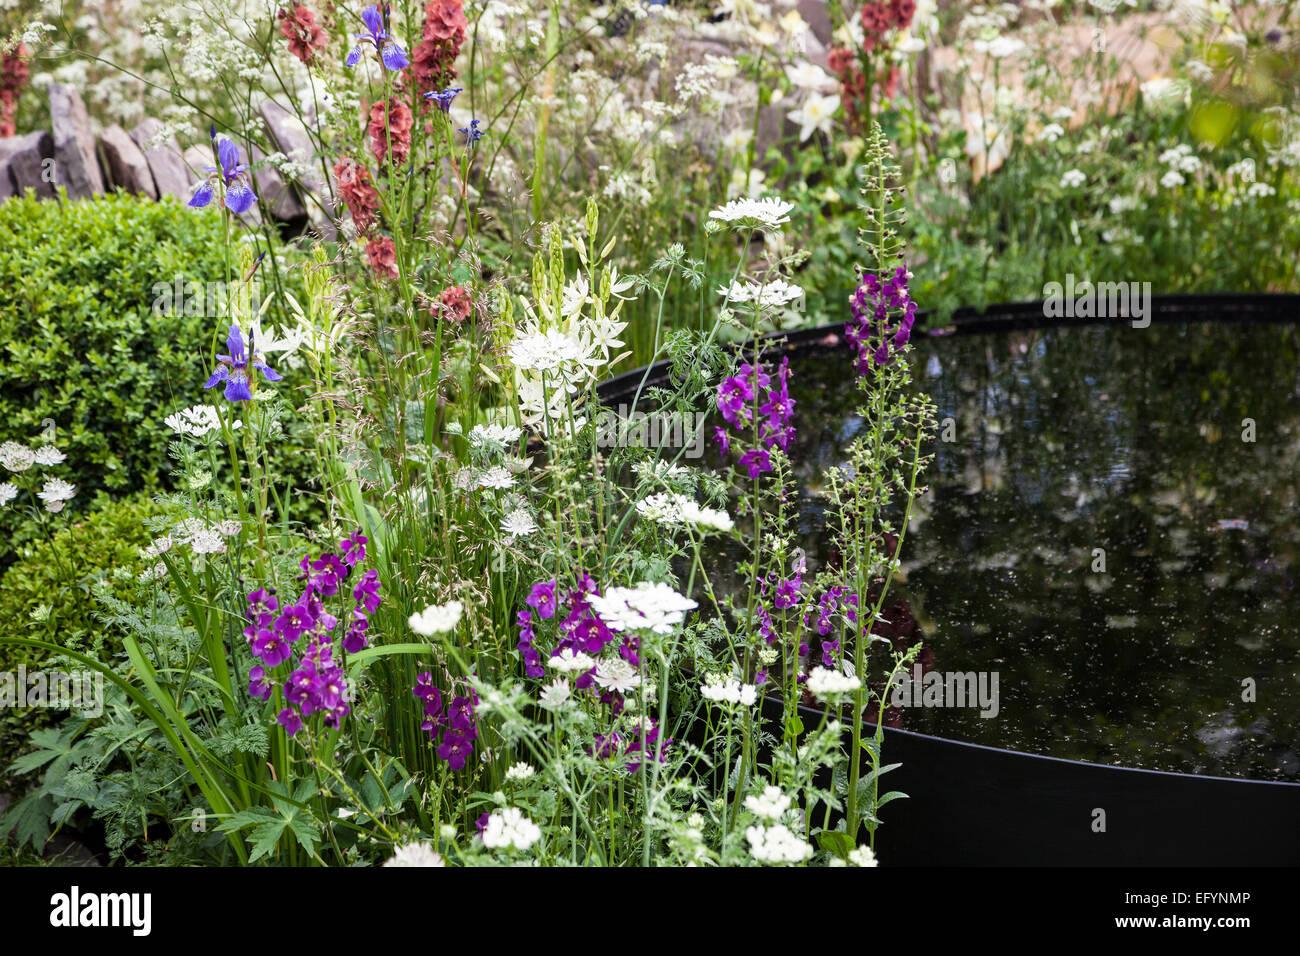 Black water bassin, box balls and naturalistic planting featuring verbascum and orlaya - Stock Image